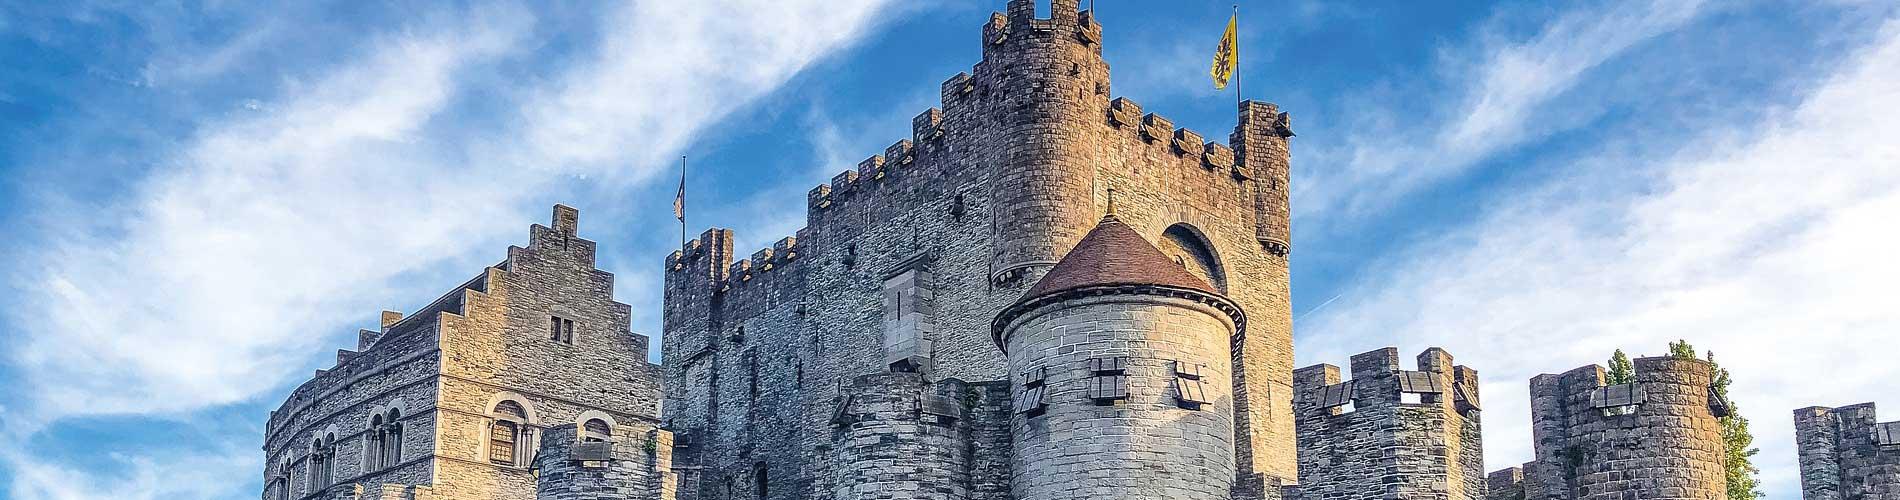 Blog_TopTenWinterBreaks_Ghent_CastleOfCounts_1900x500_Q120